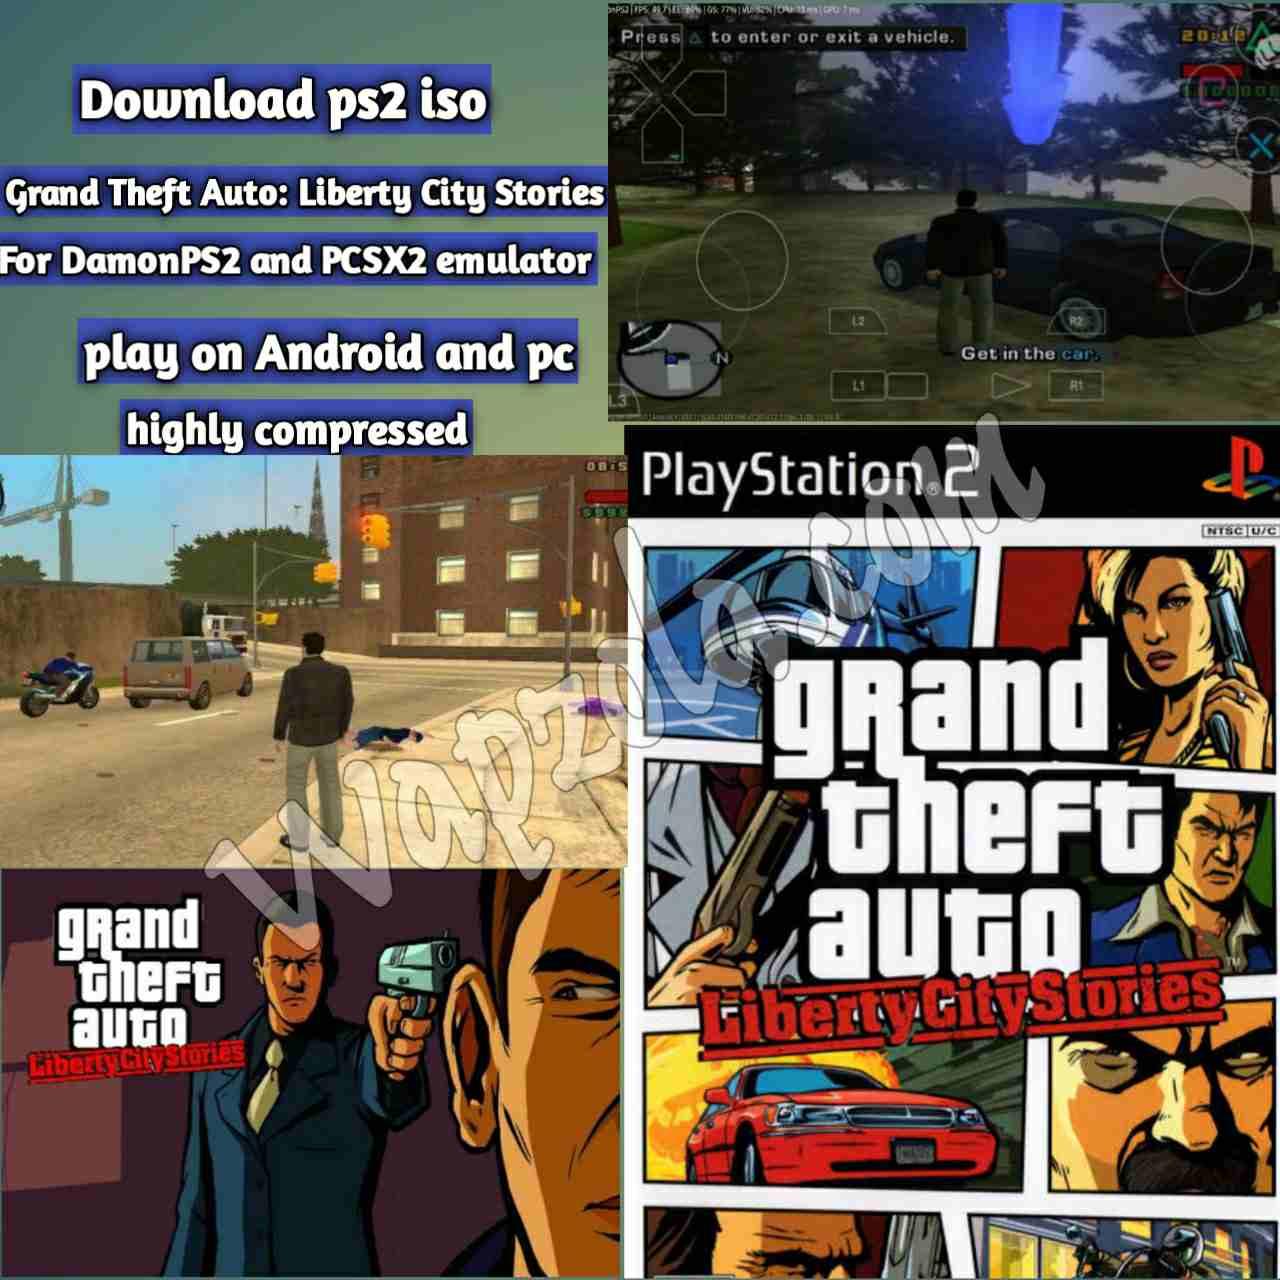 gta-liberty-city-stories-ps2-iso-damonps2-pcsx2-playstation-2